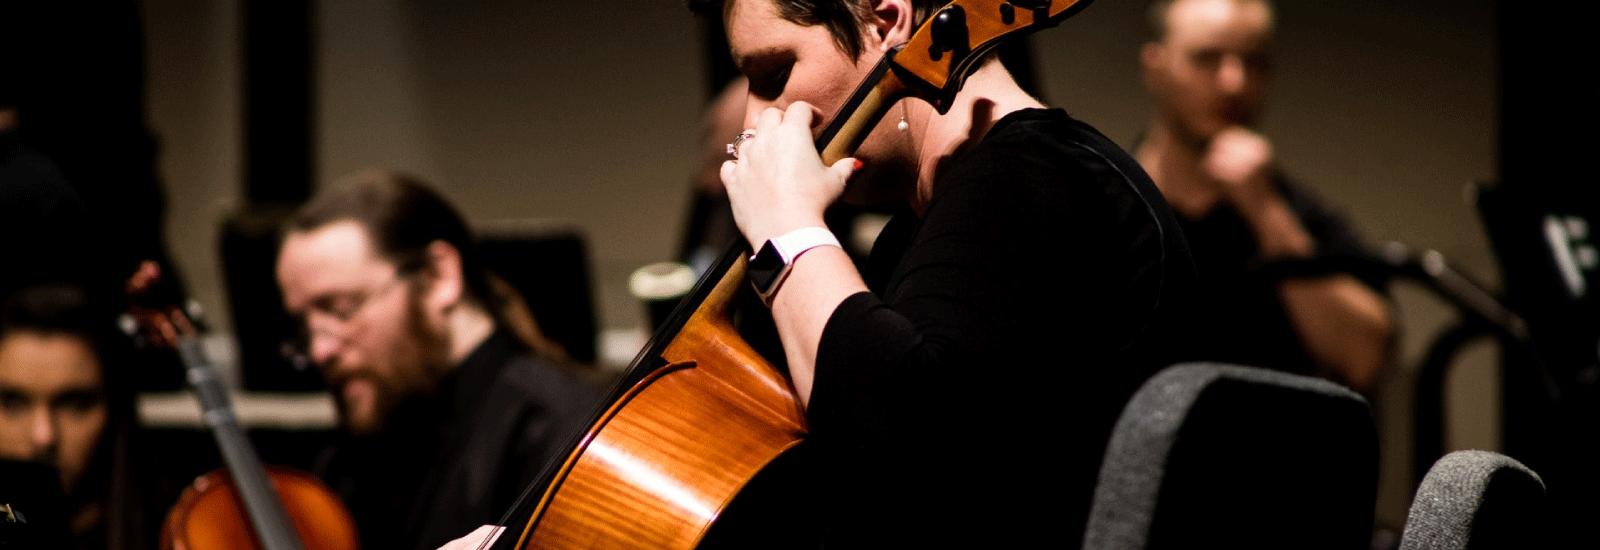 Providence Performing Arts Center, Providence, RI